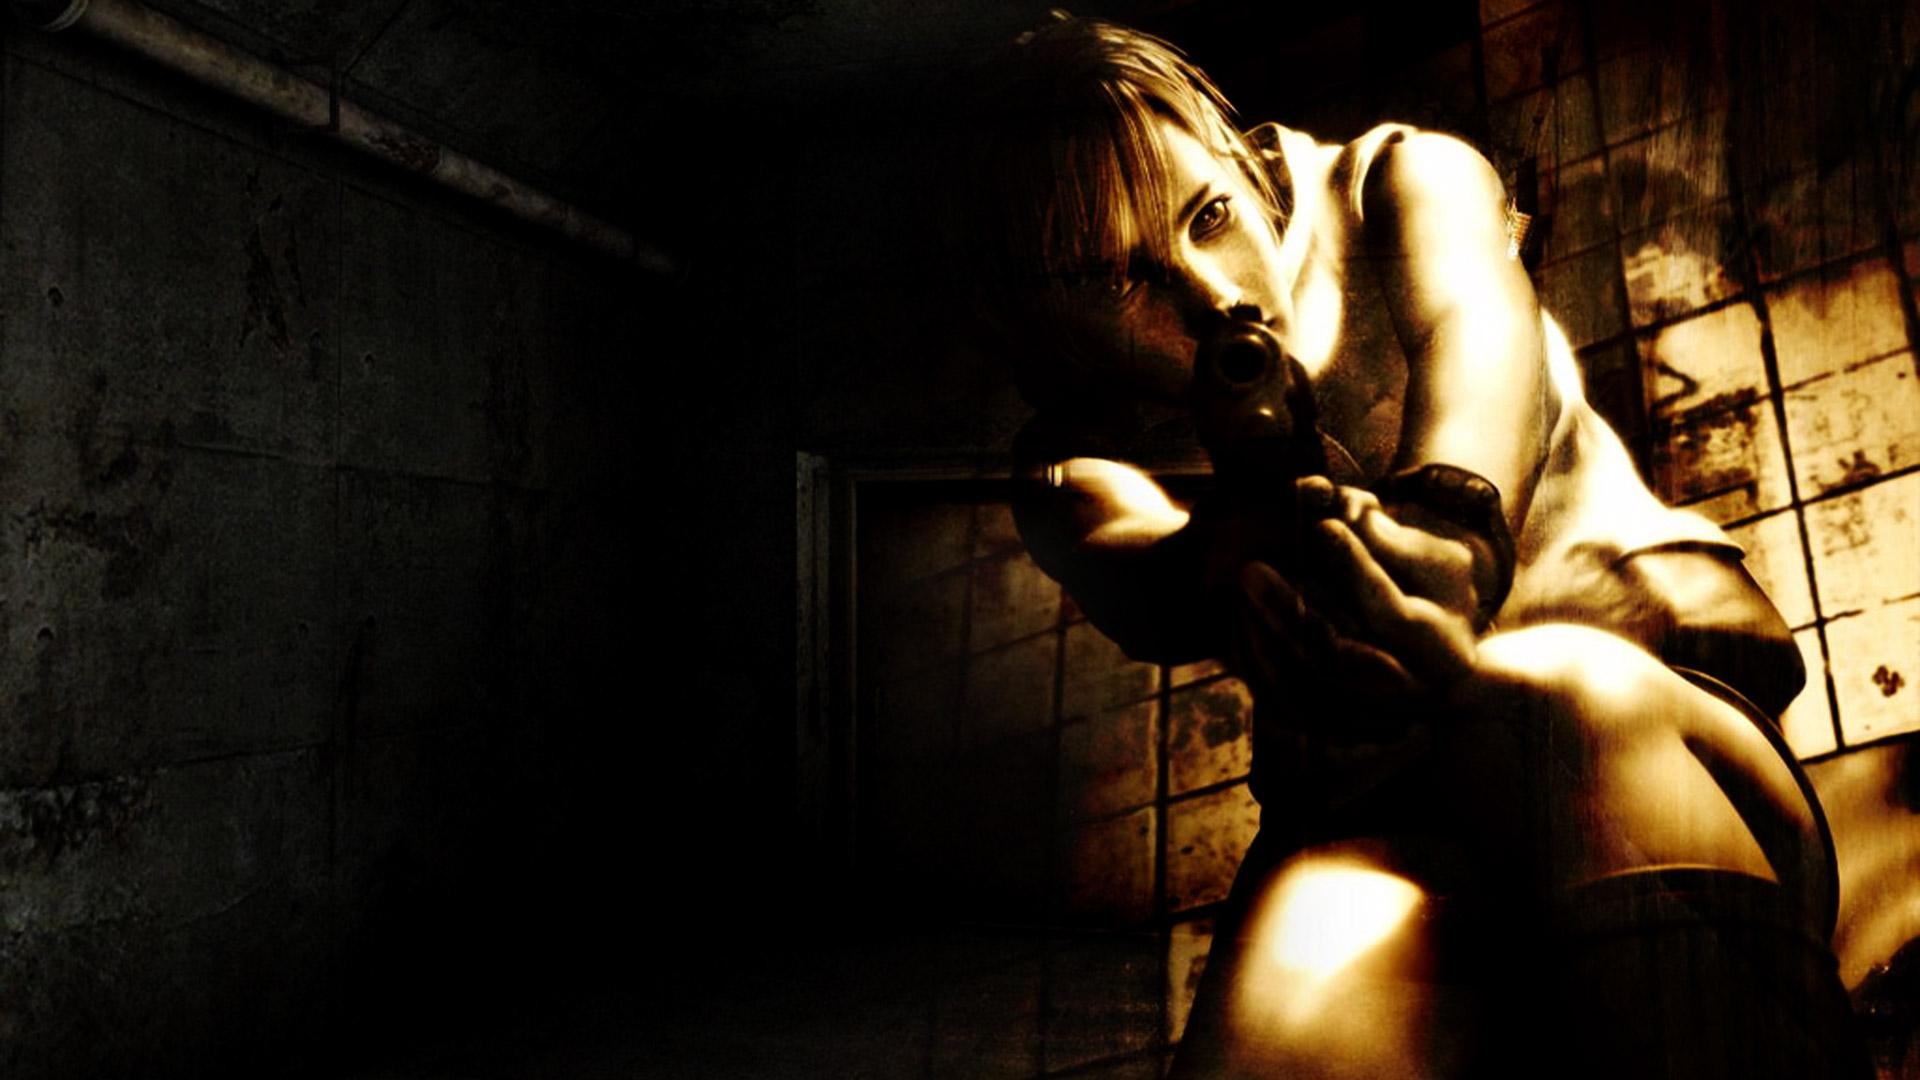 Silent Hill 3 Wallpaper in 1920x1080